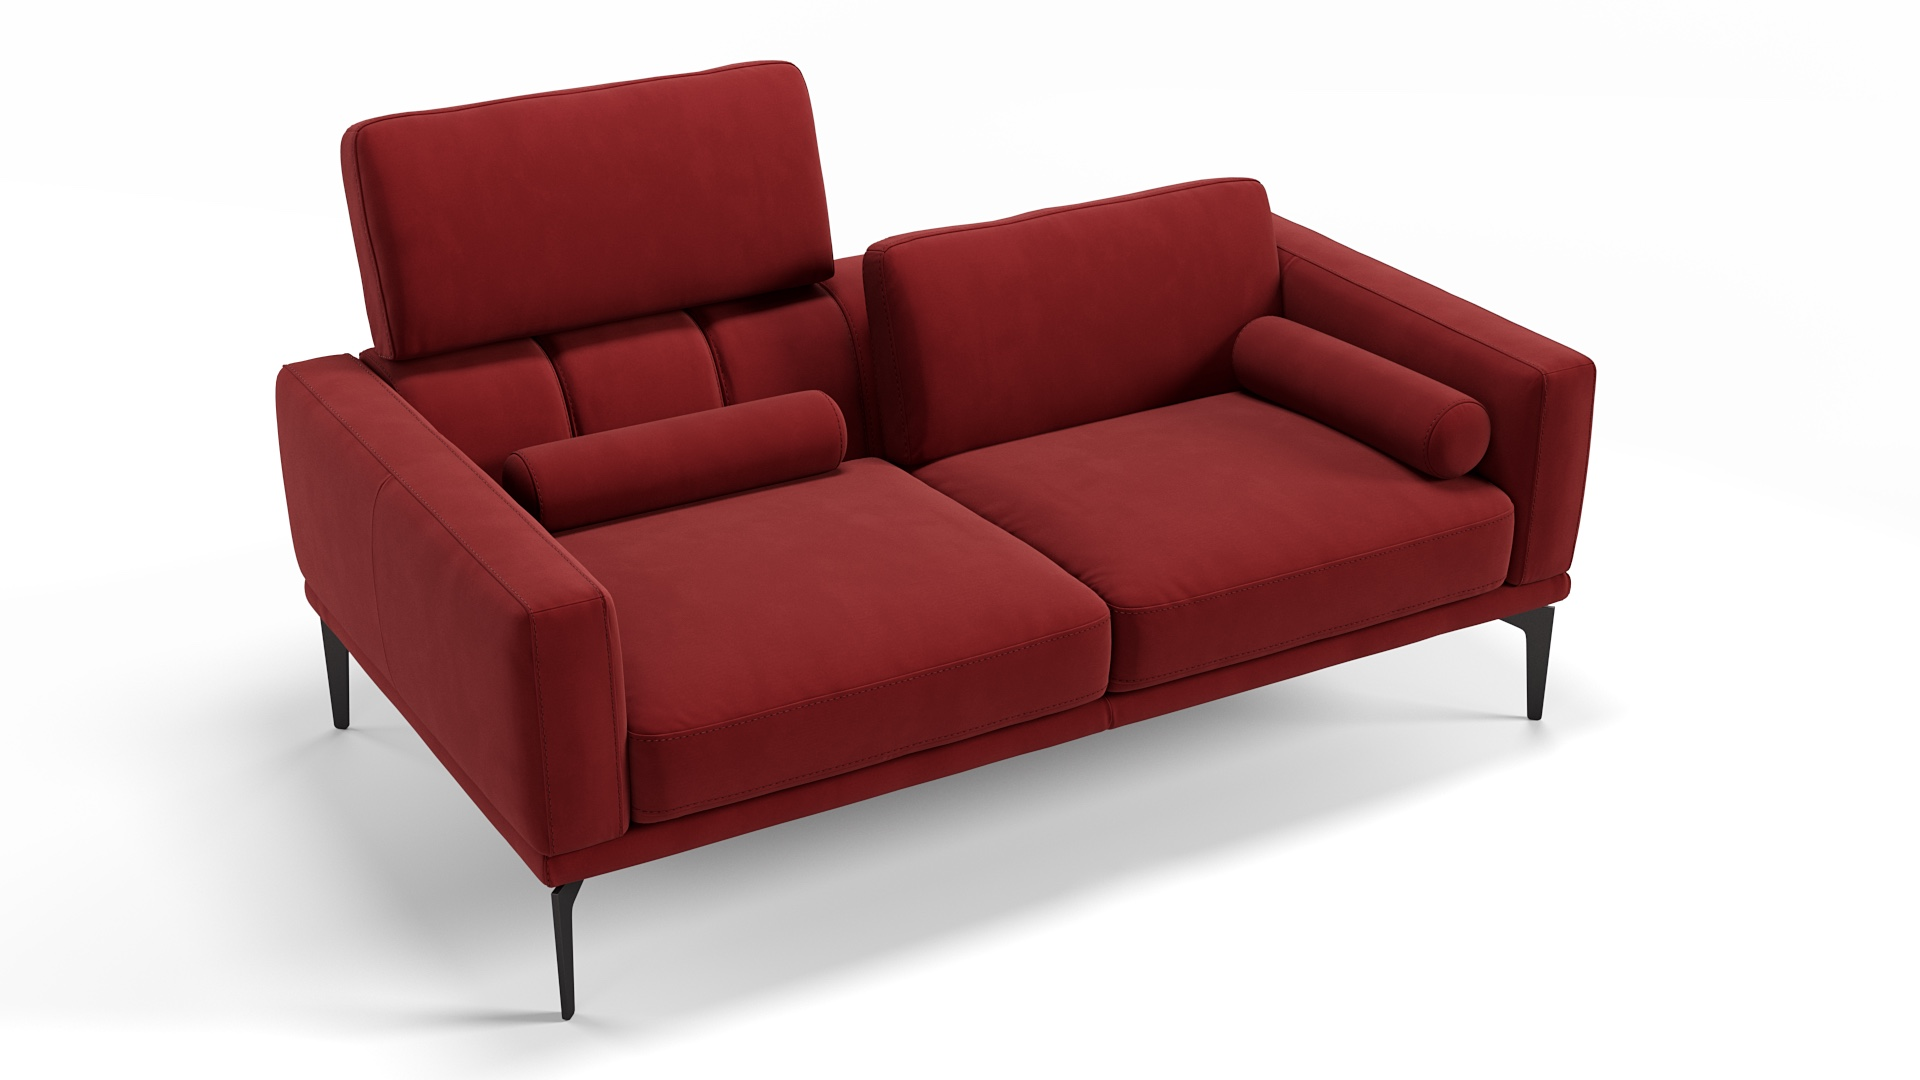 Stoff 2-Sitzer Sofa SALERNO